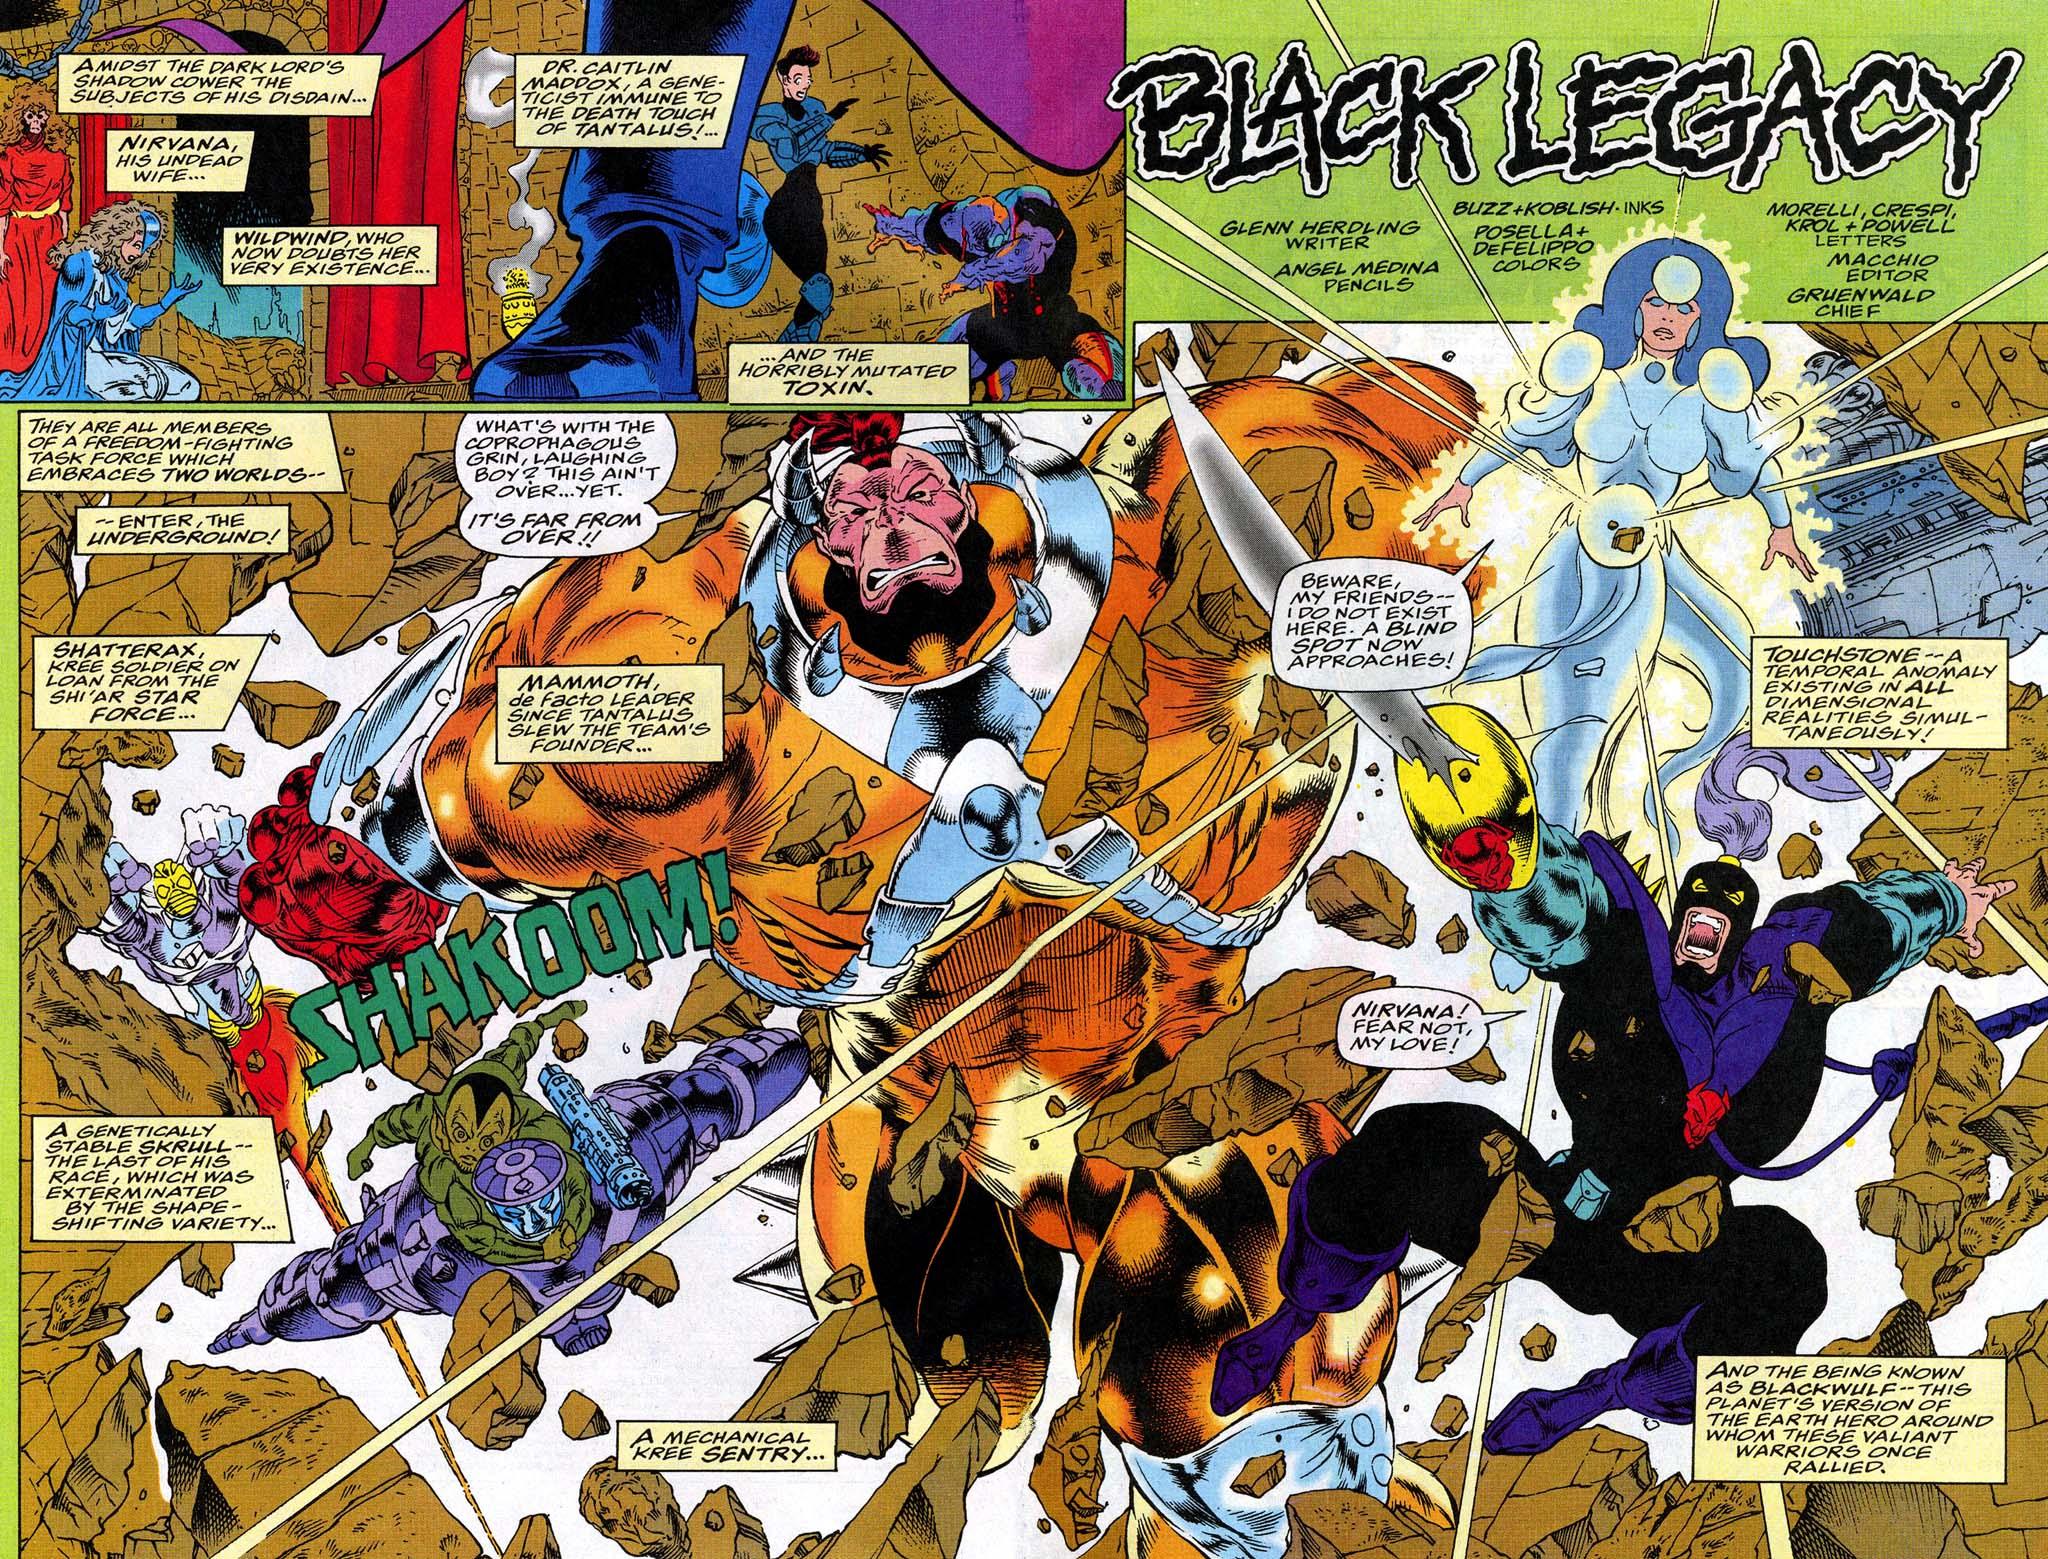 Read online Blackwulf comic -  Issue #10 - 3